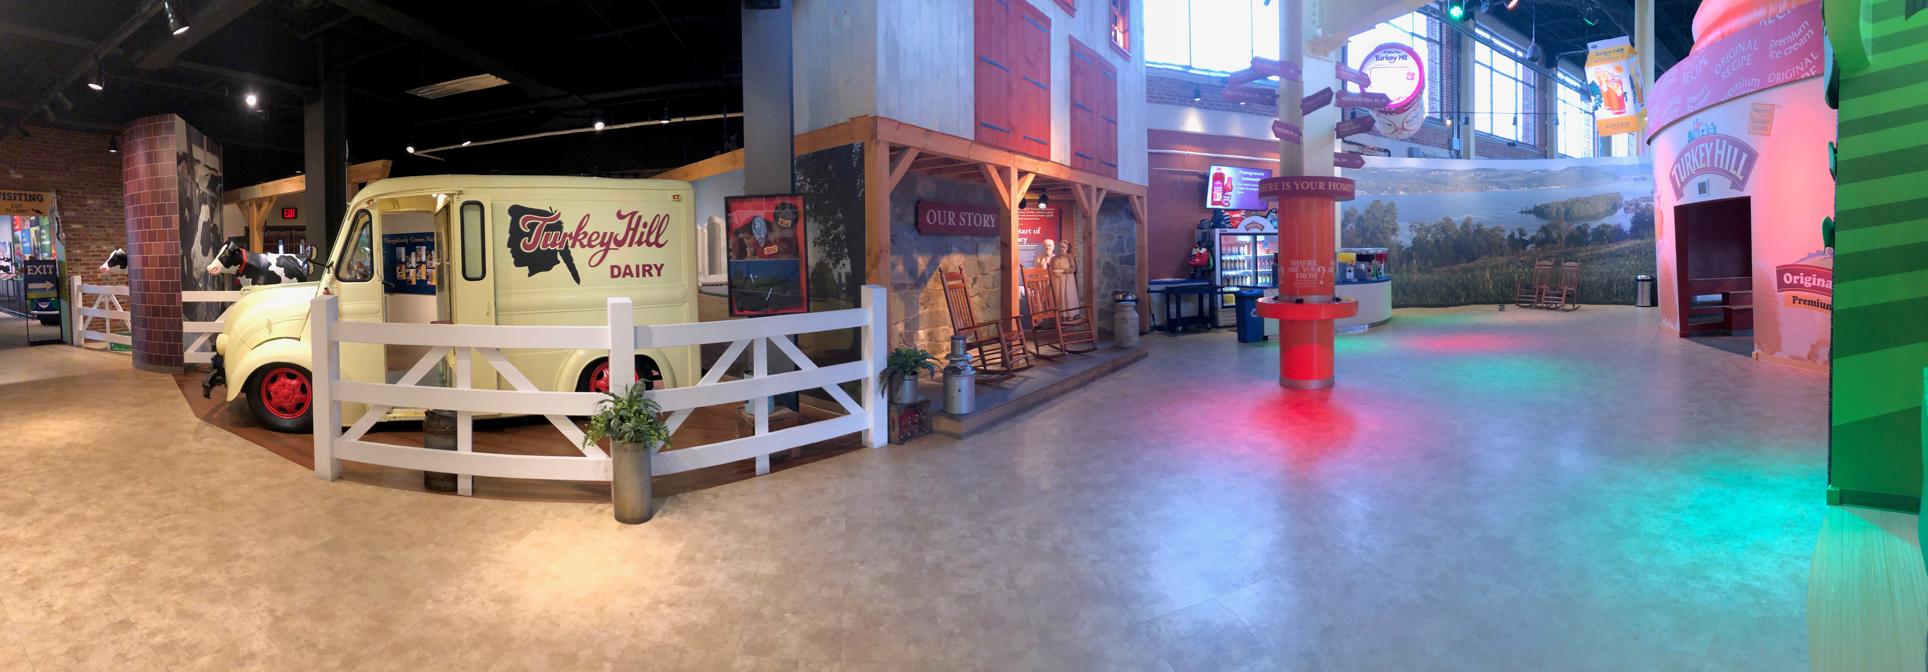 Turkey Hill Experience exhibit